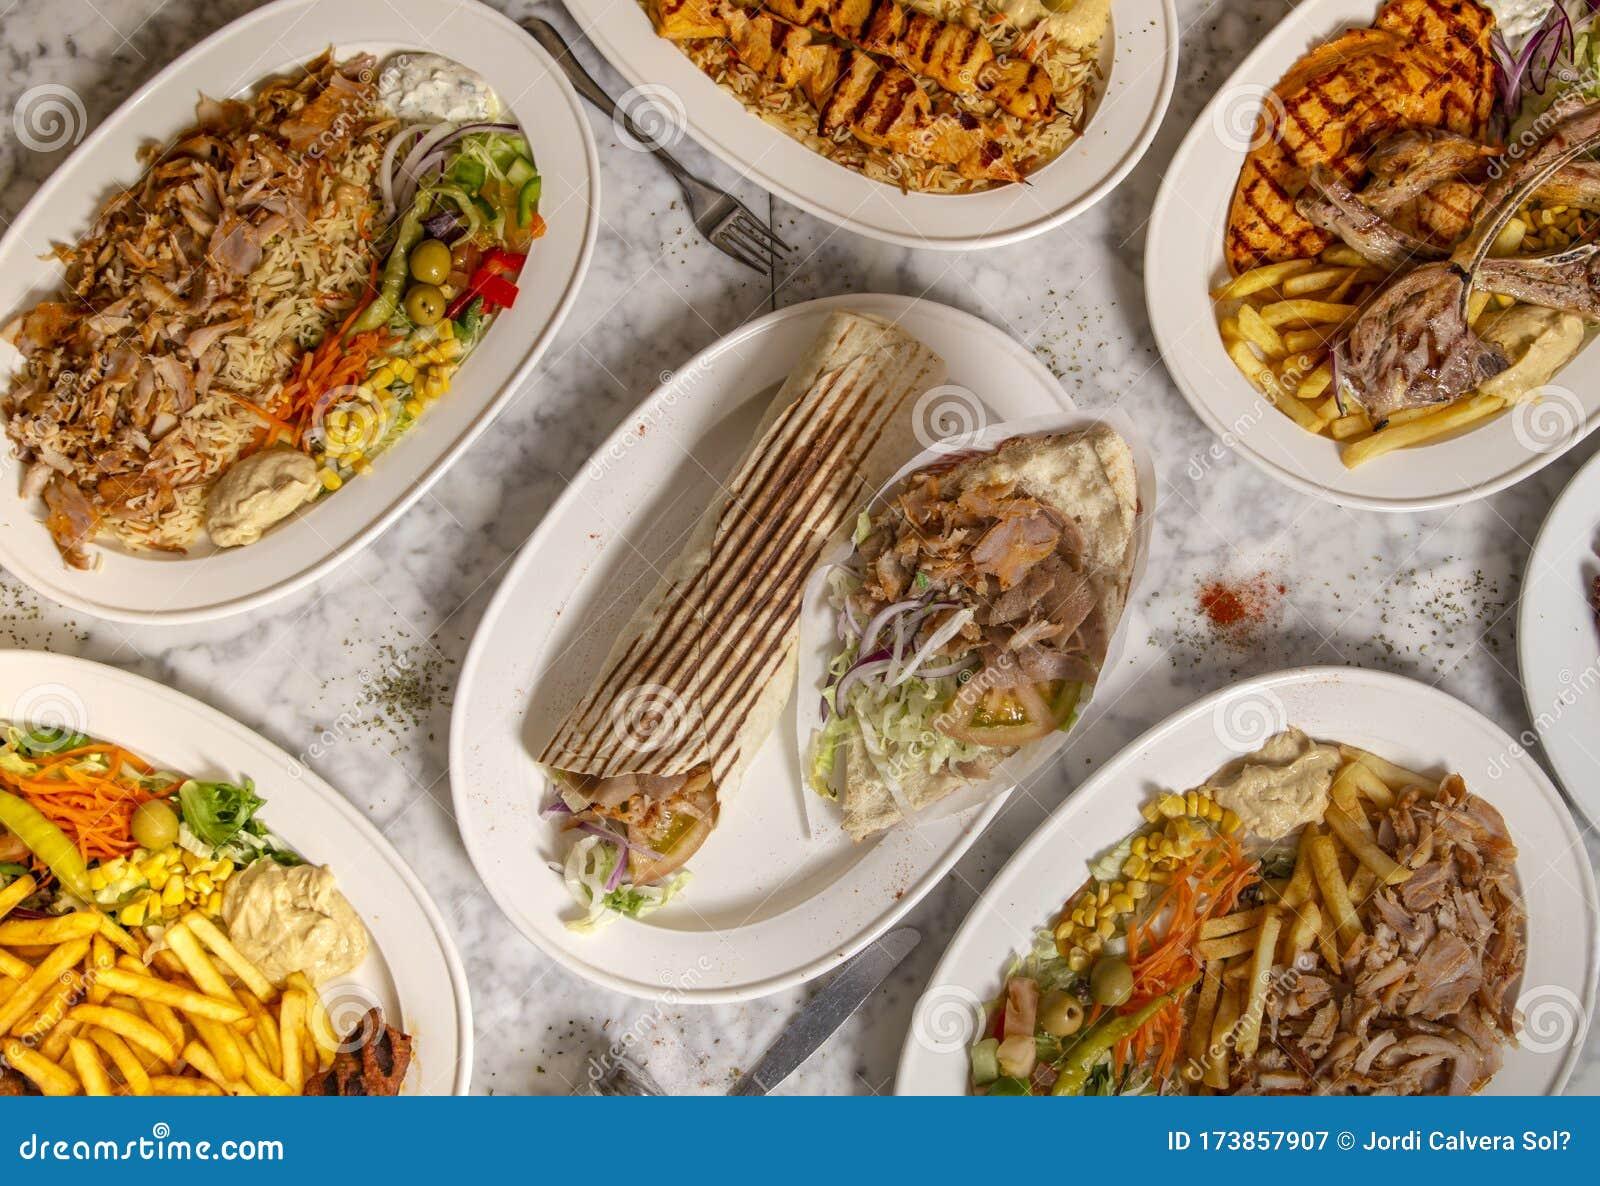 Variety Of Typical Turkish Dishes Restaurant Menu Durum Donner Kebab Salad And Chips Stock Image Image Of Dark Assortment 173857907